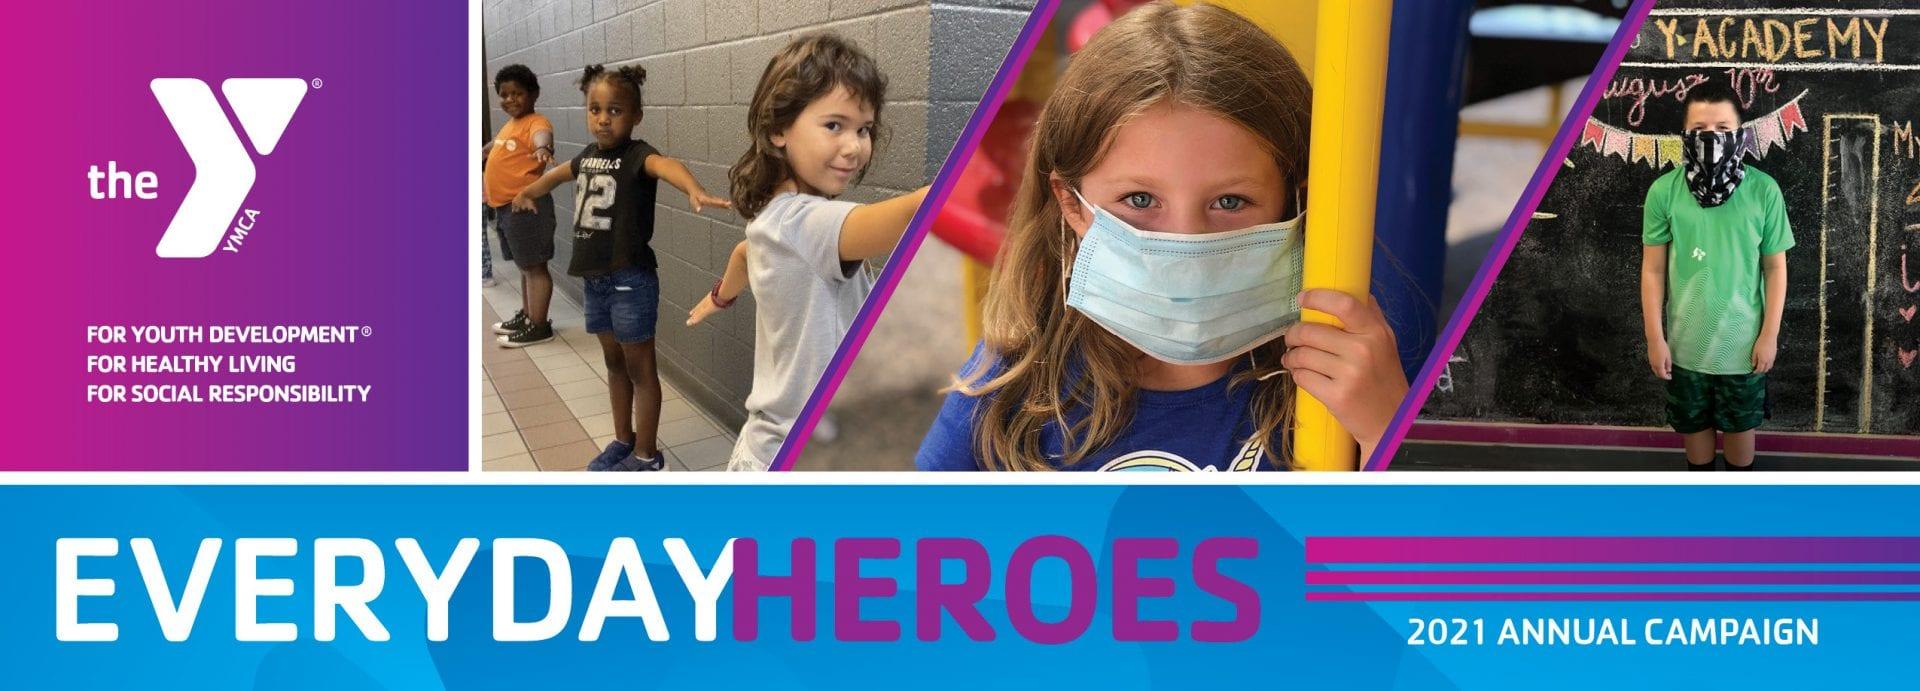 everyday heroes - donate